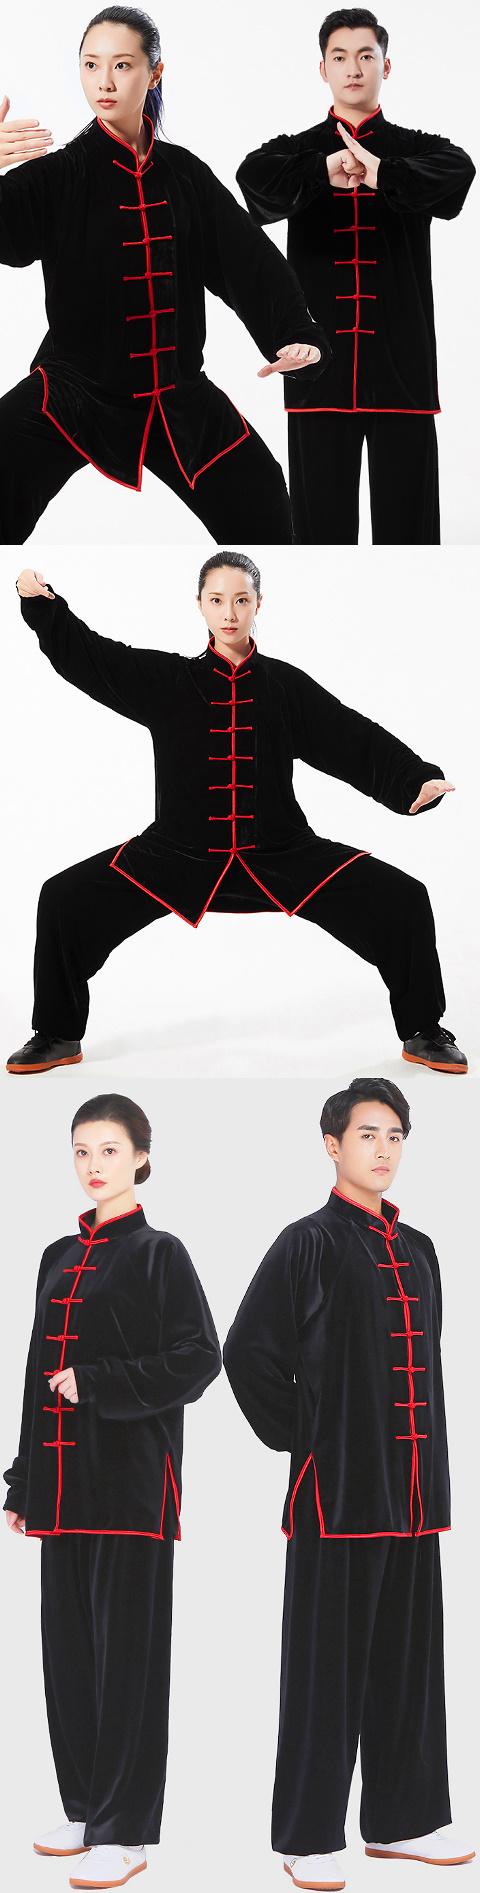 Professional Taichi Kungfu Uniform with Pants - Velvet (RM)